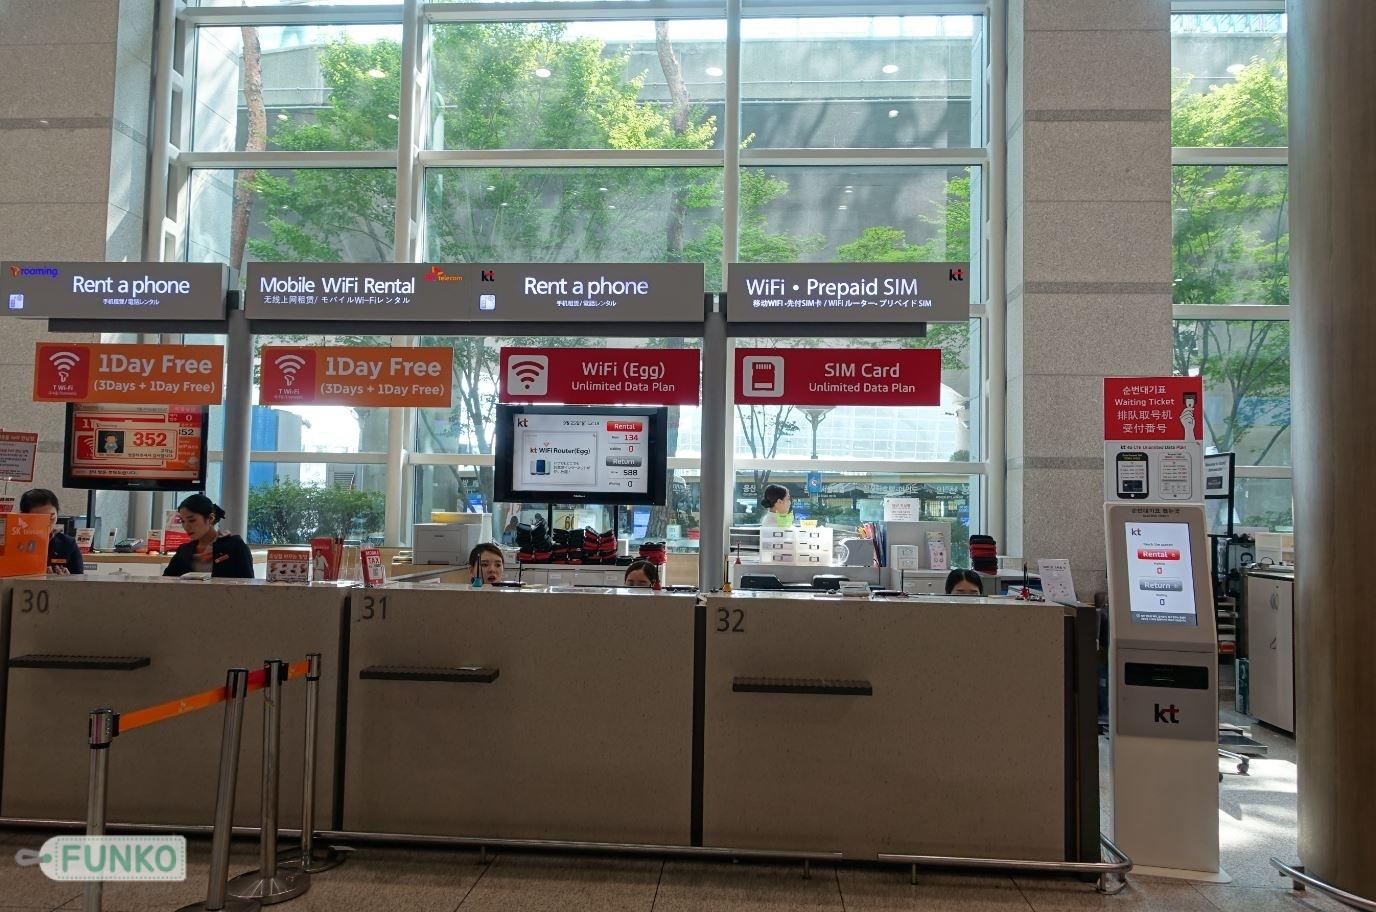 simcard incheon airport